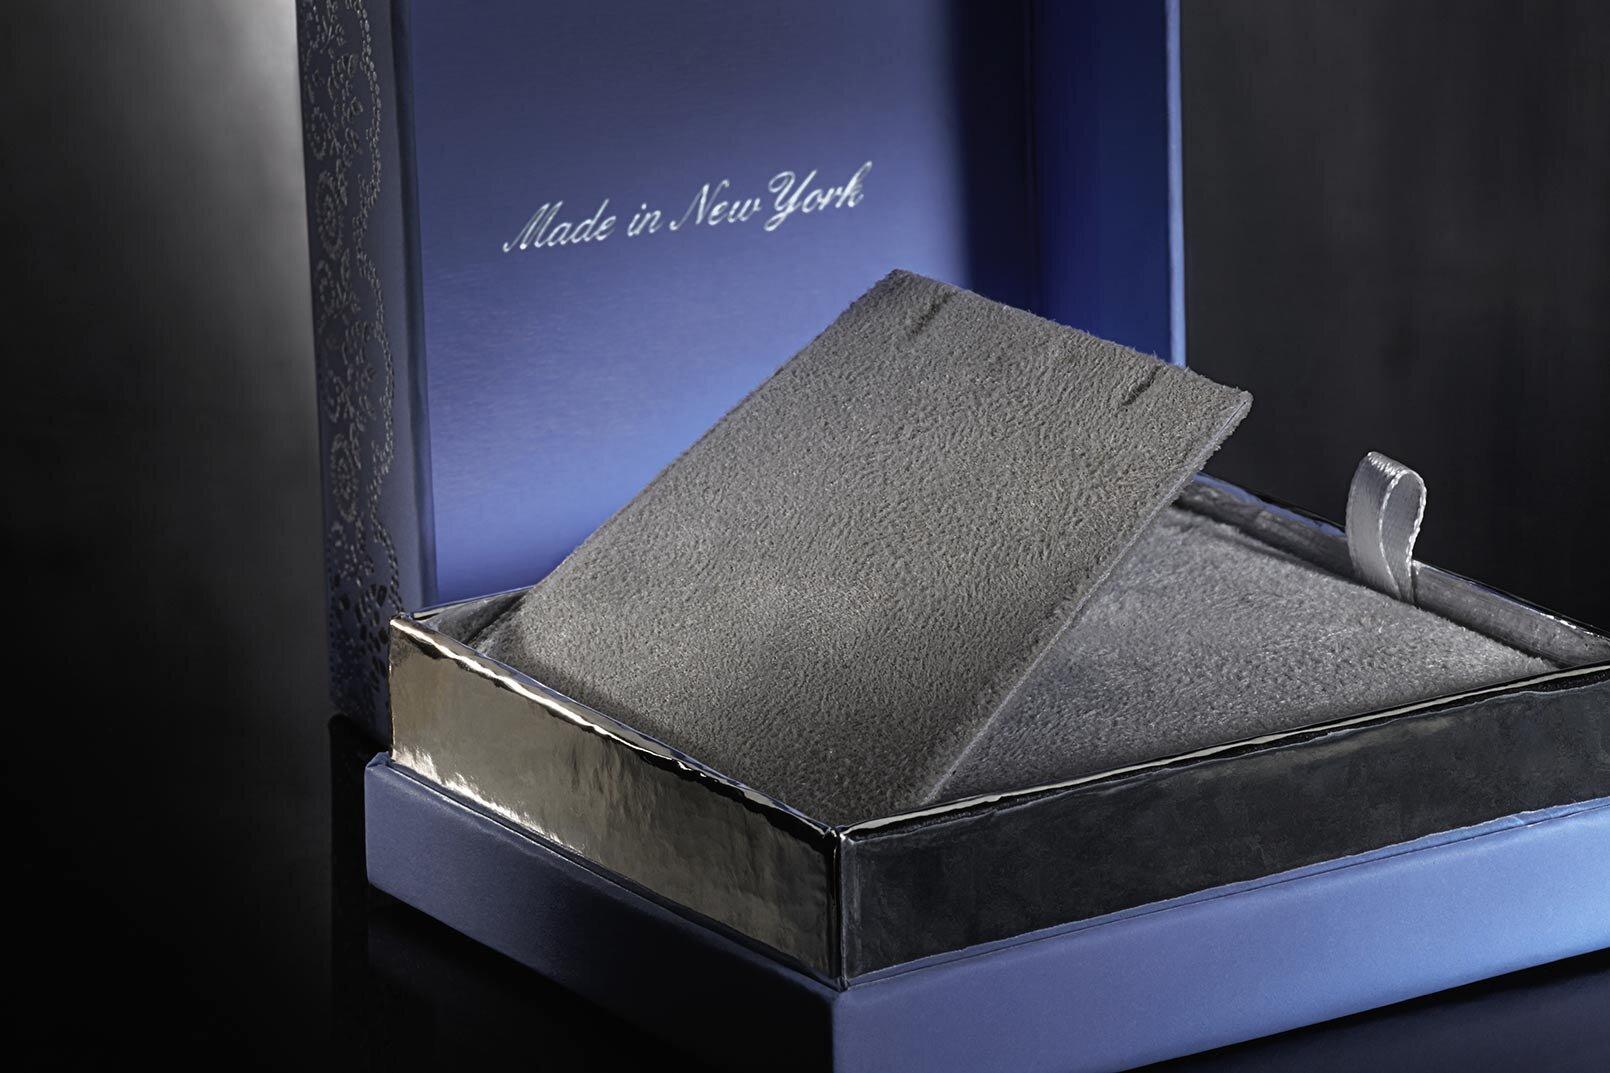 Larkspur-Hawk-Box-Design-Packaging-Company-2.JPG